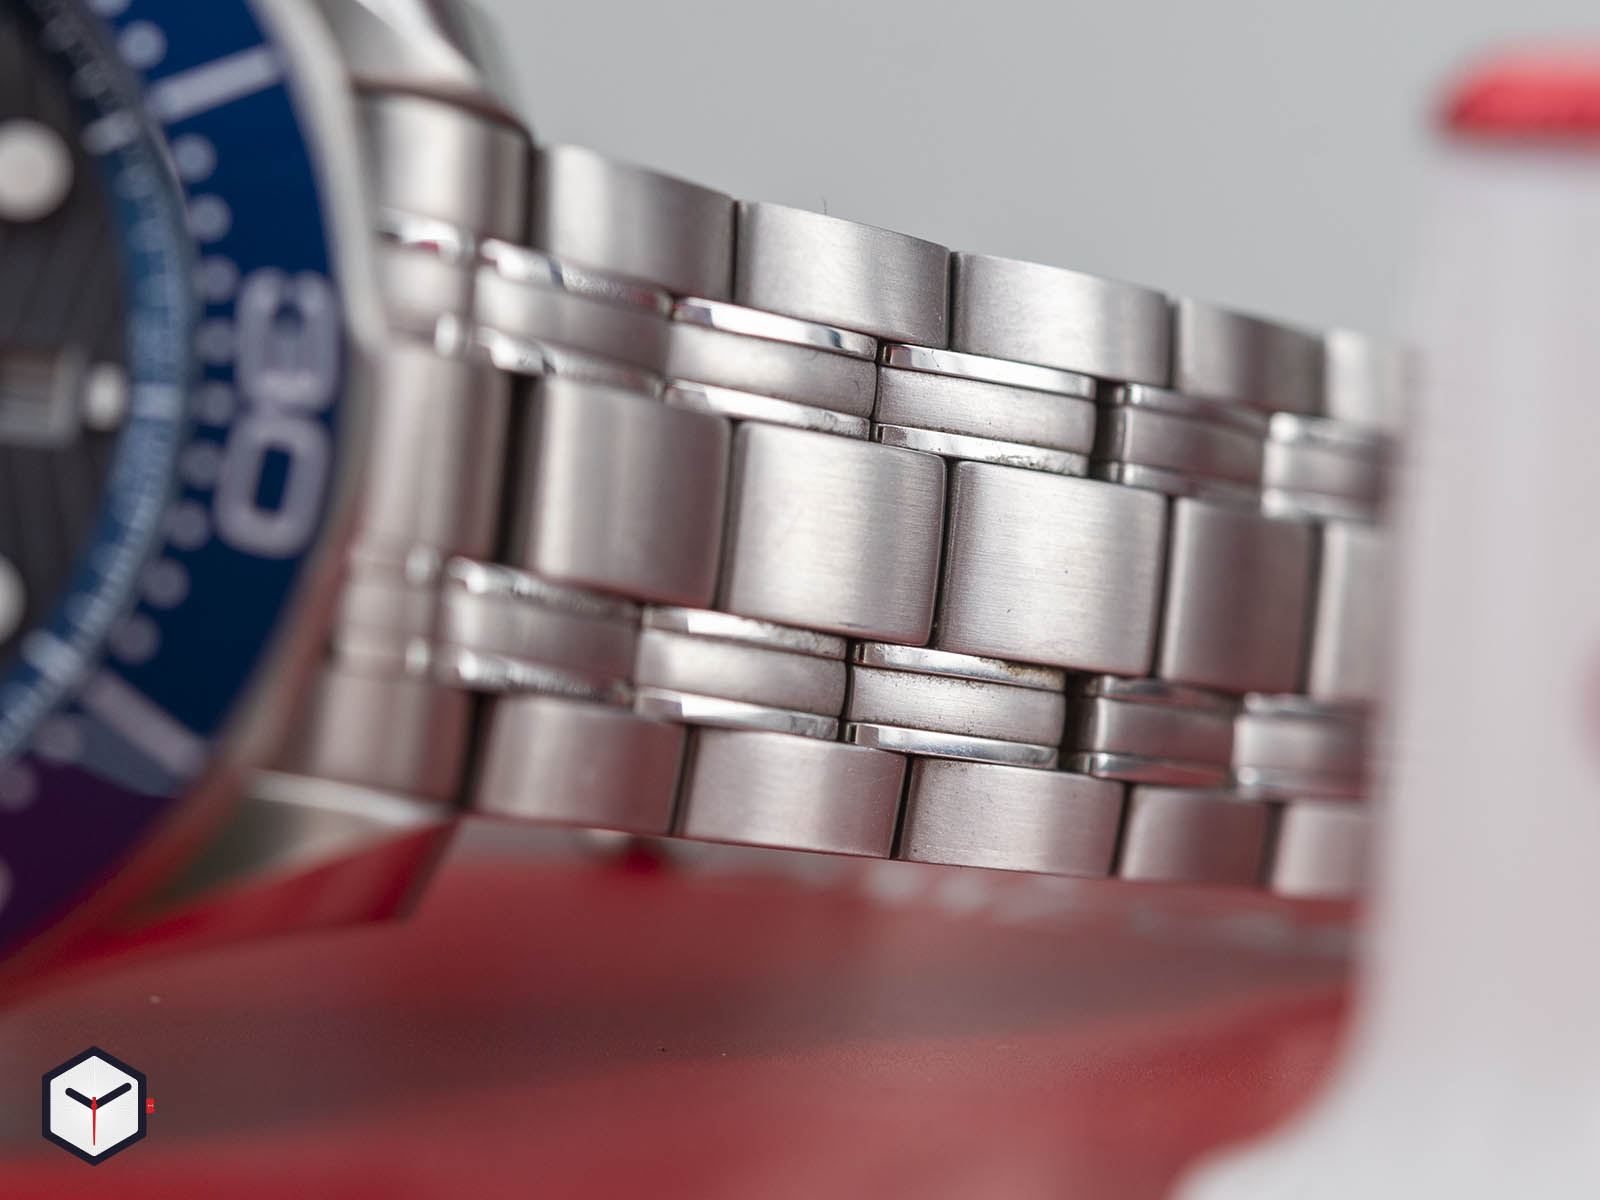 210-30-44-51-06-001-omega-diver-300m-co-axial-master-chronometer-chronograph-44-6.jpg